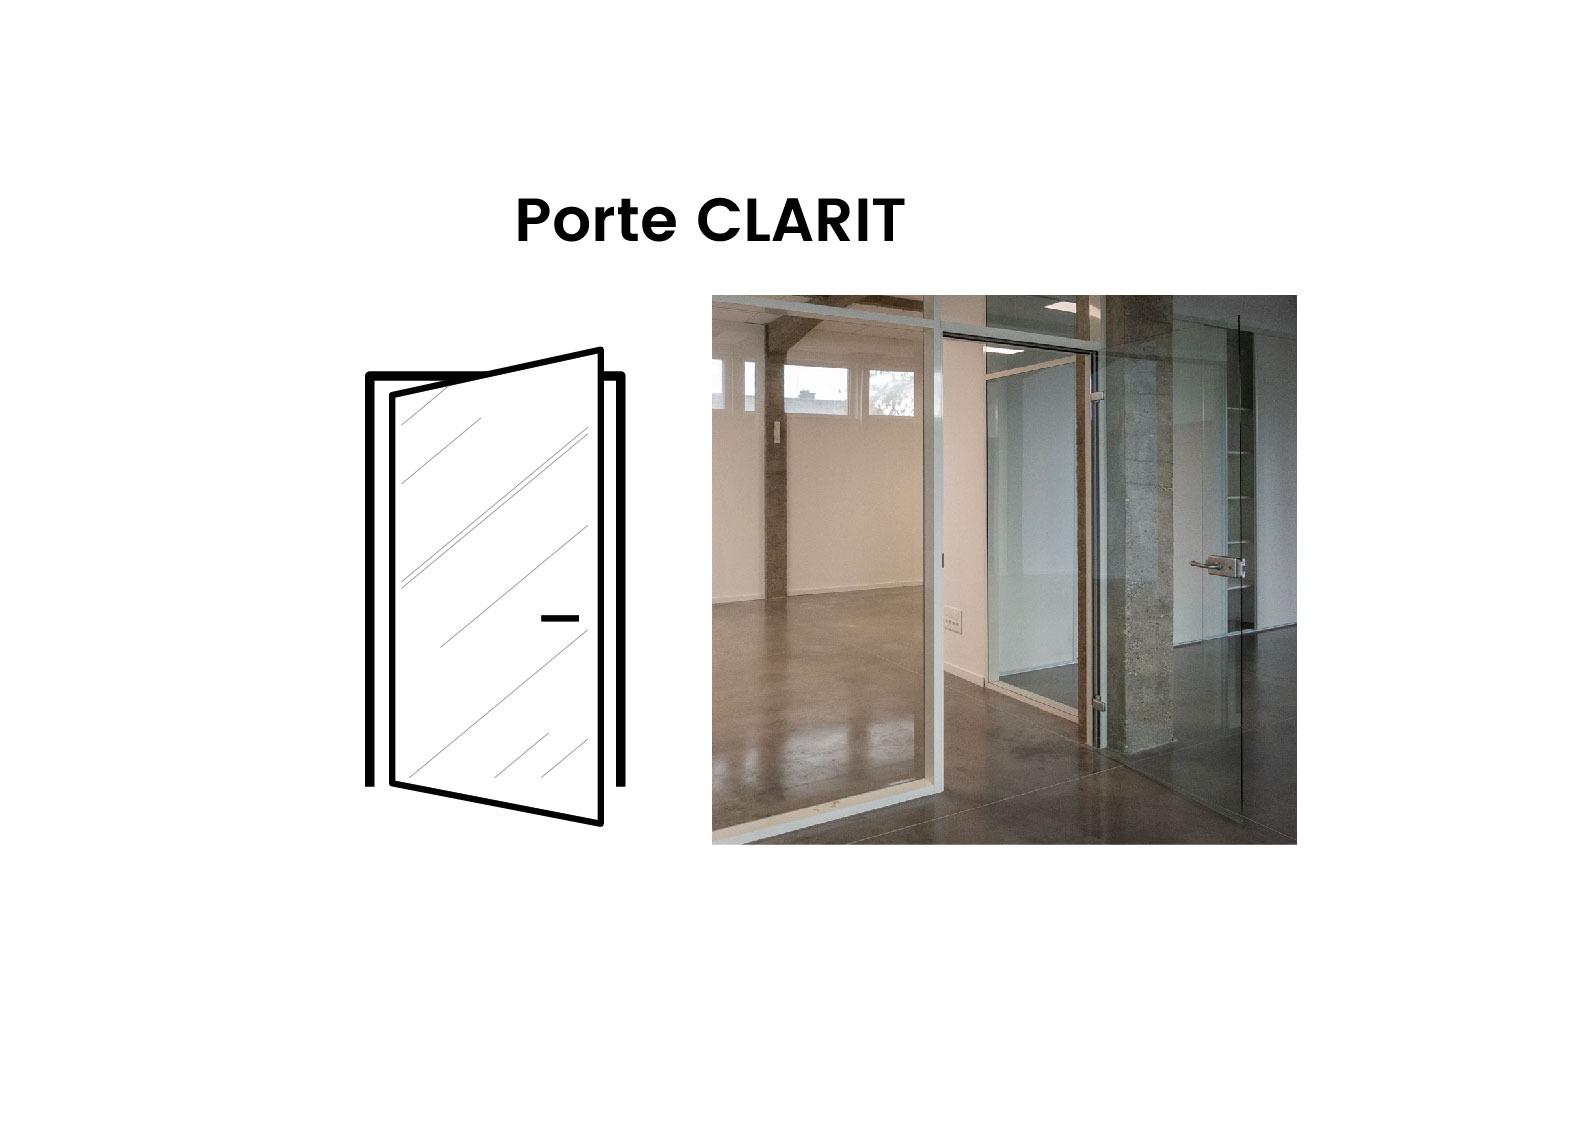 Porte Vitree Porte Clarit Langlois Sobreti